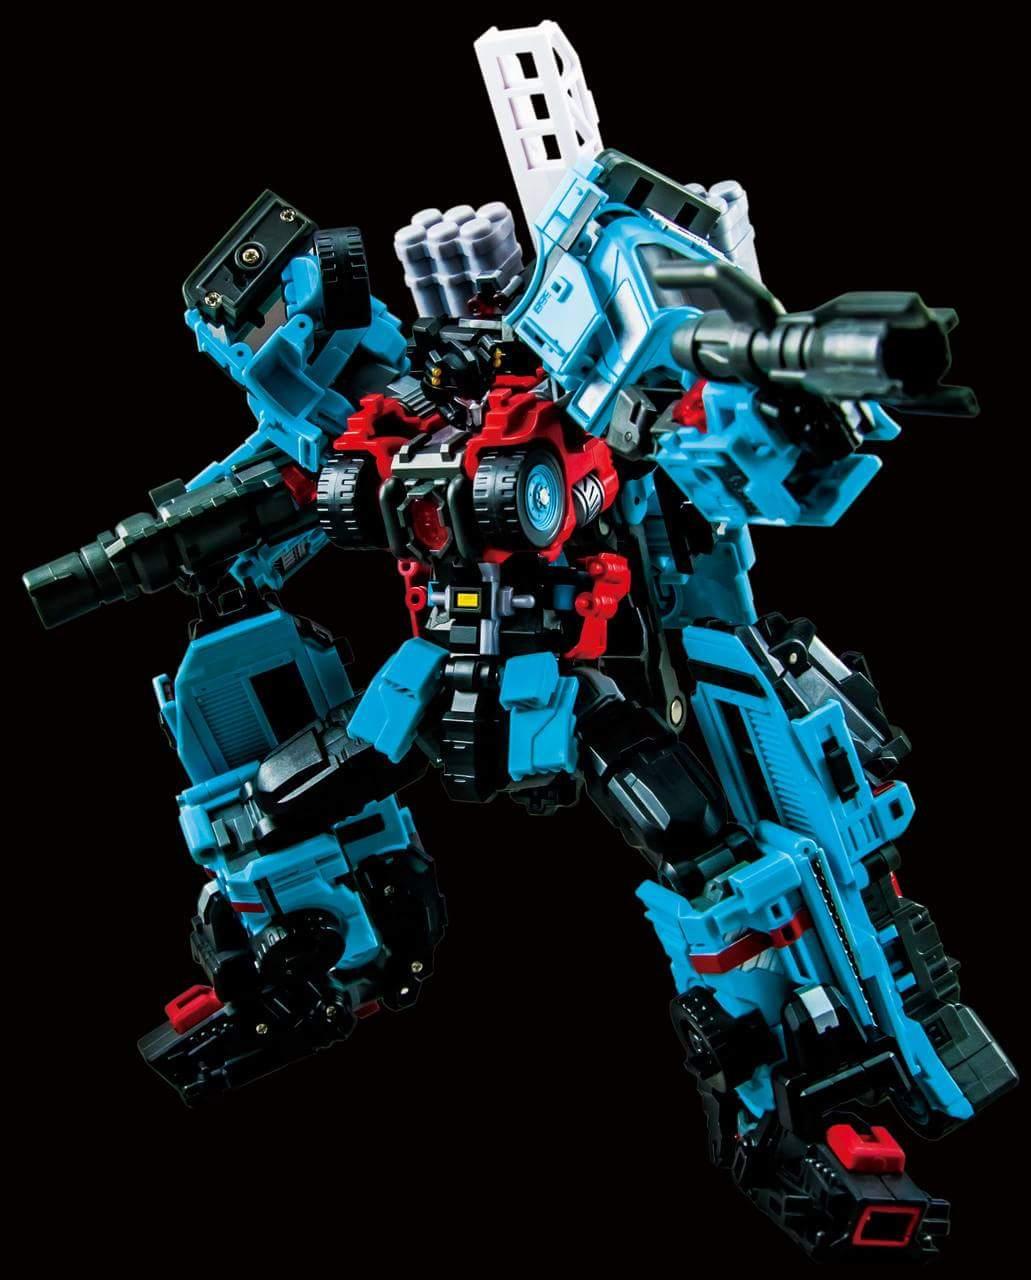 [MakeToys] Produit Tiers - Jouet MTCM-04 Guardia (aka Protectobots - Defensor/Defenso) - Page 4 PVYE0fze